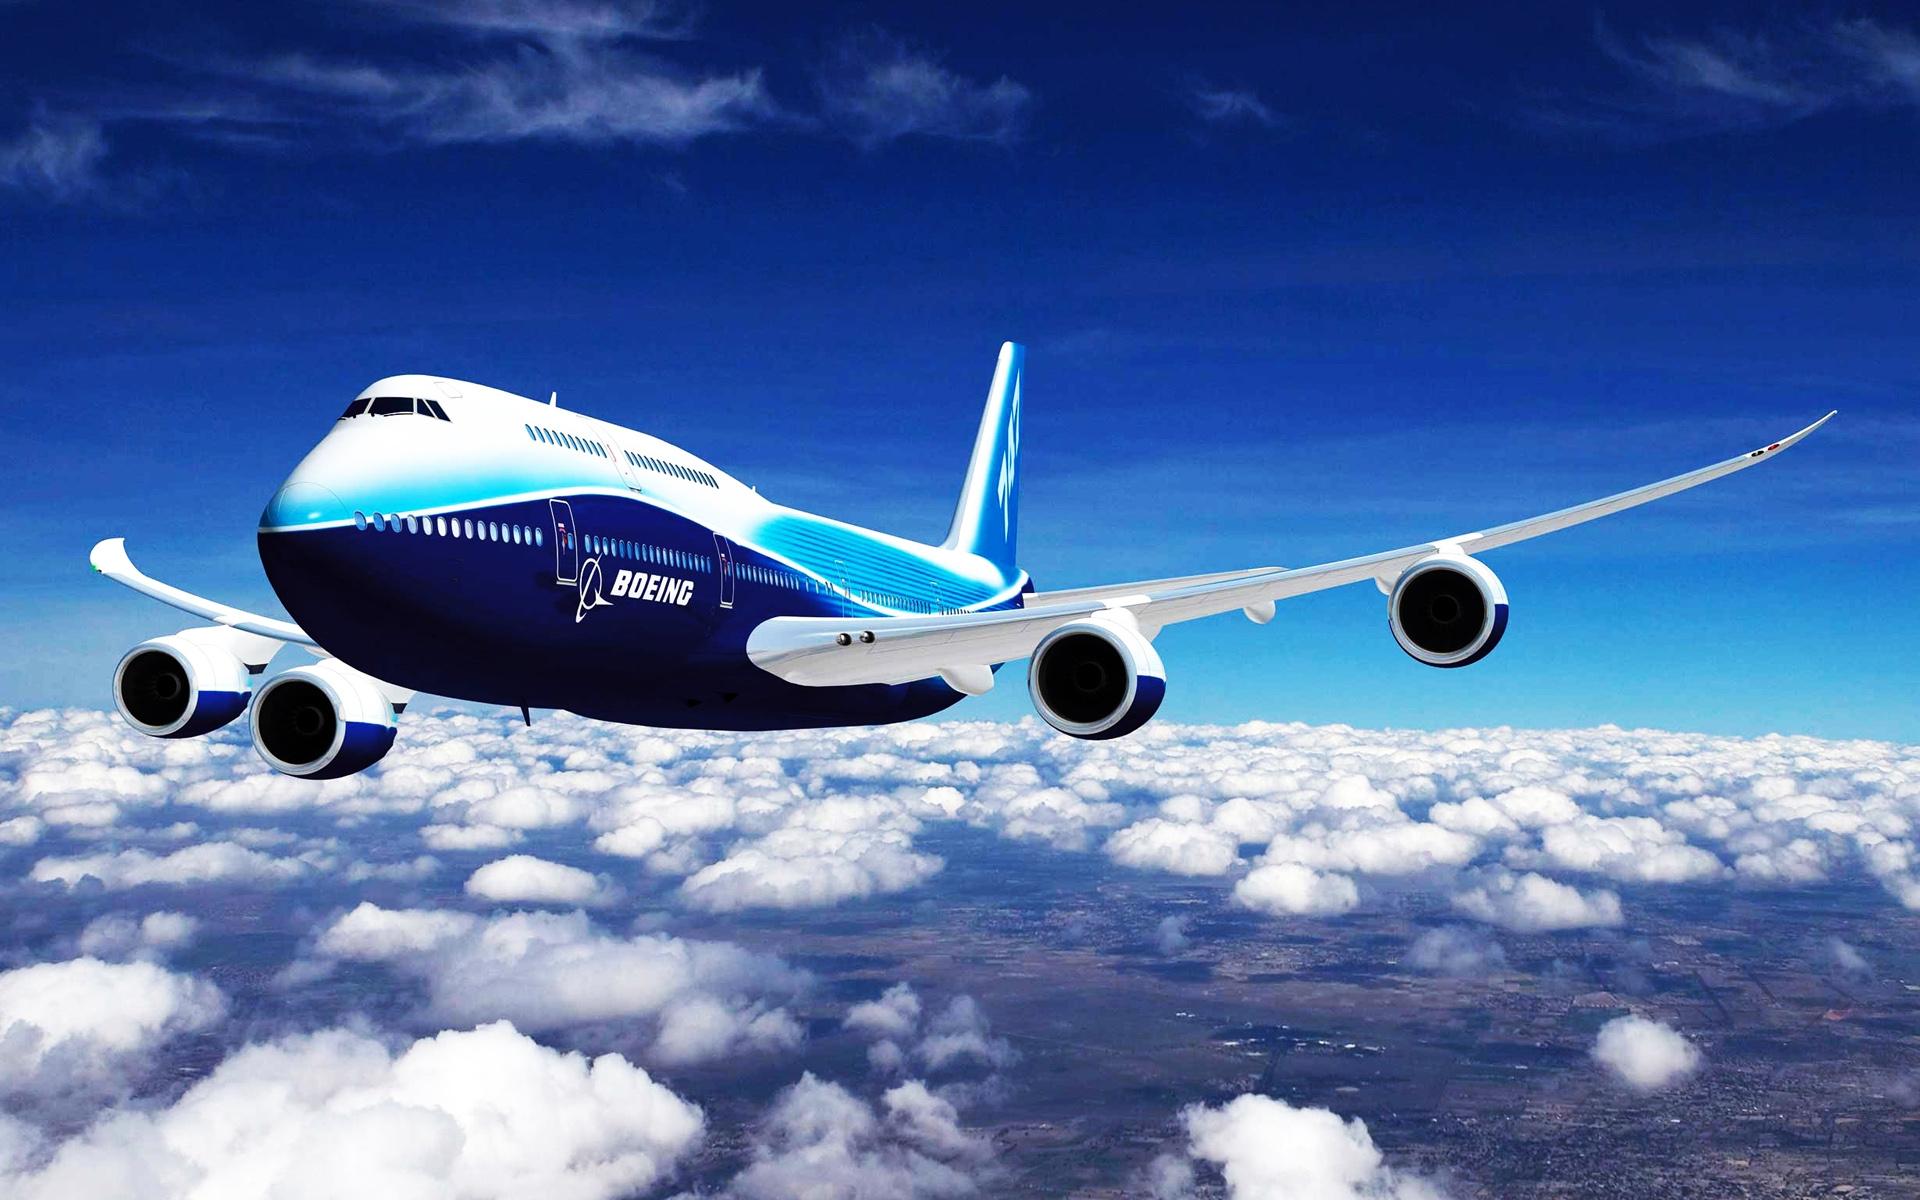 Aircraft Backgrounds, Compatible - PC, Mobile, Gadgets| 1920x1200 px